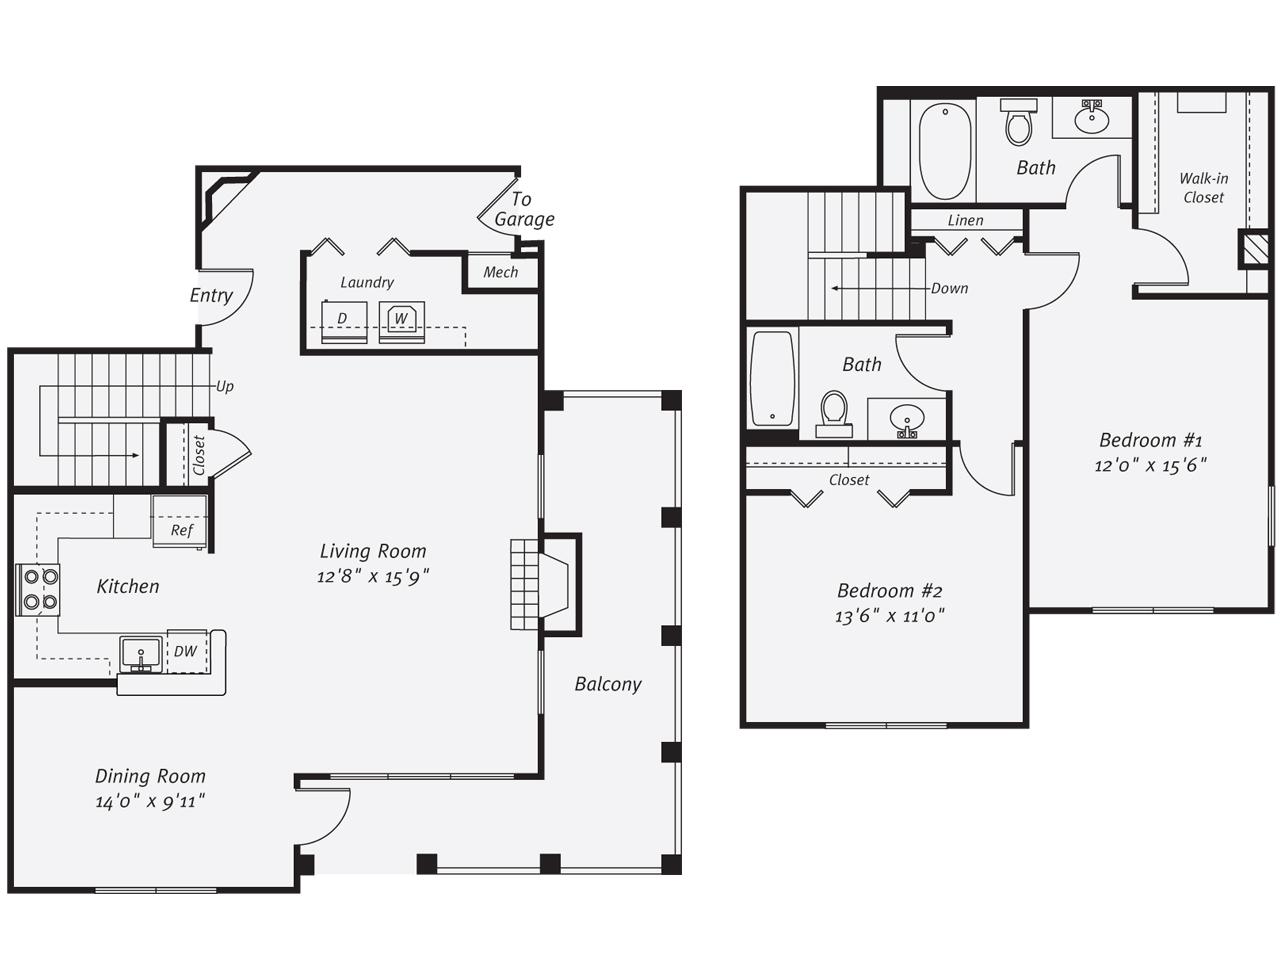 Ny coram thepointatpineridge p0571769 ny014 bt12g 2 floorplan